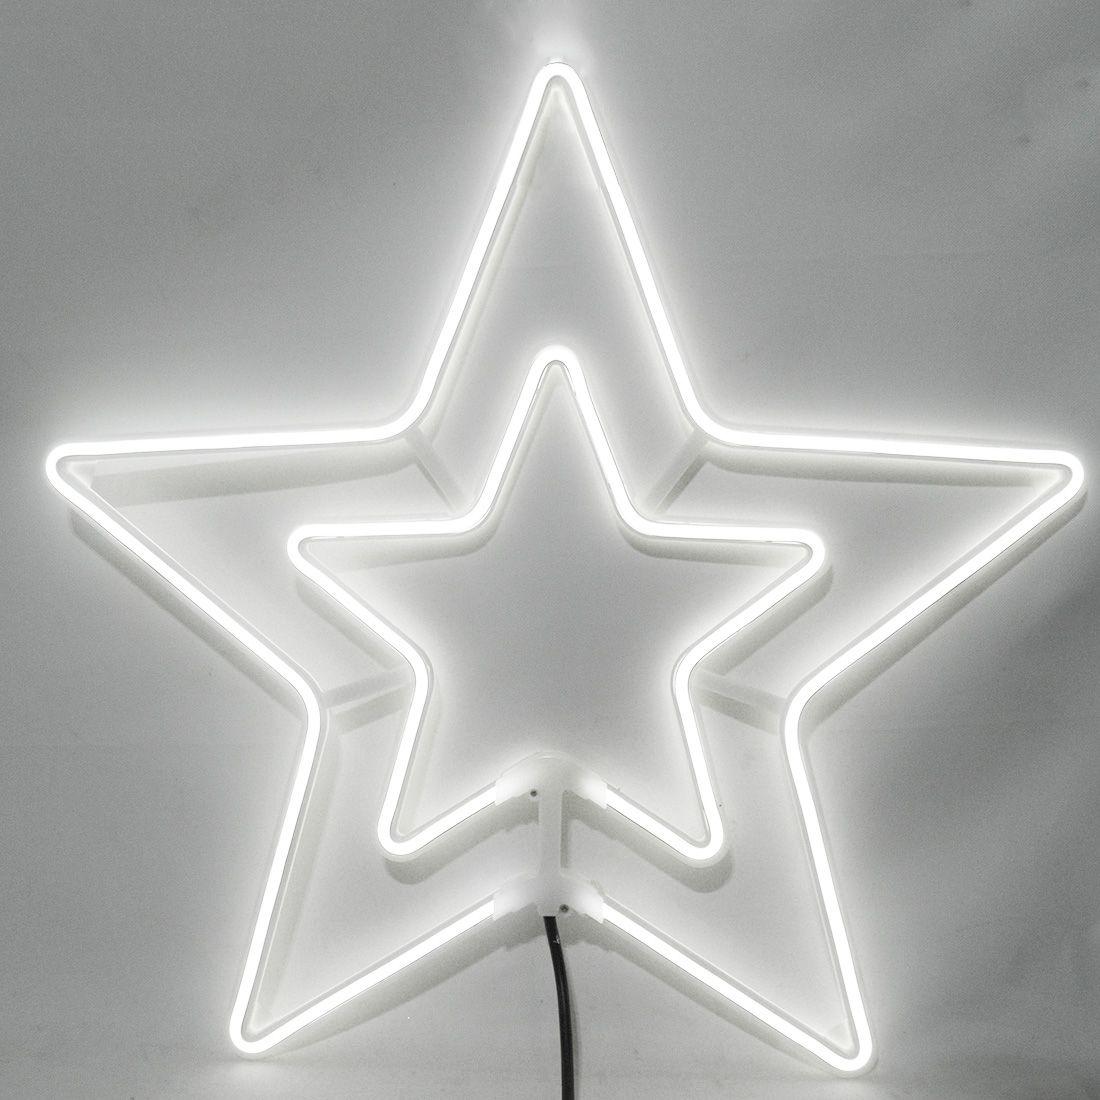 Estrela Pisca Pisca Natal Neon Natalino 8 funcoes Branco 6000k Decoracao Enfeite